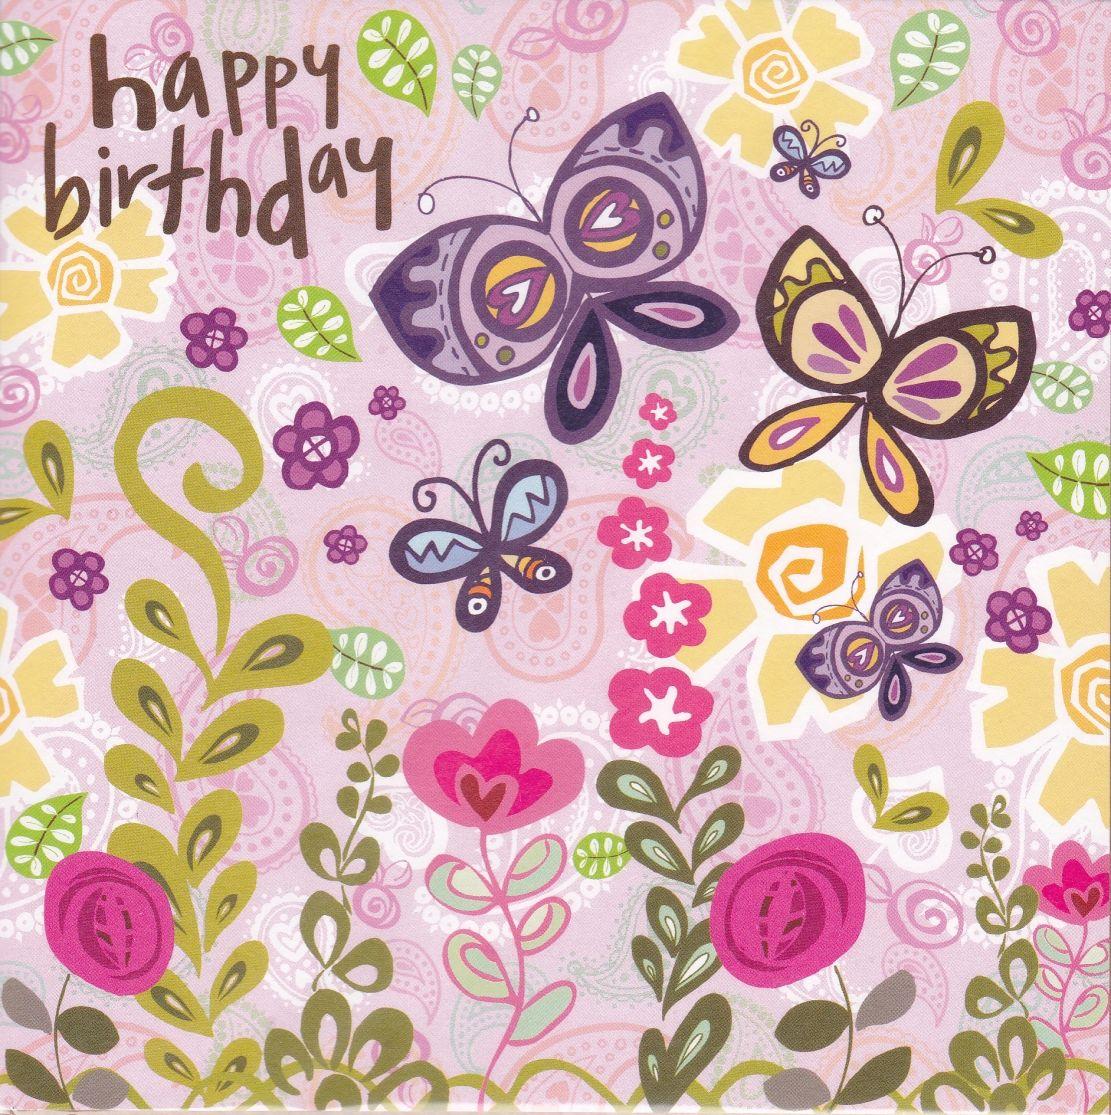 Butterflies flowers birthday card karenza paperie butterflies flowers birthday card izmirmasajfo